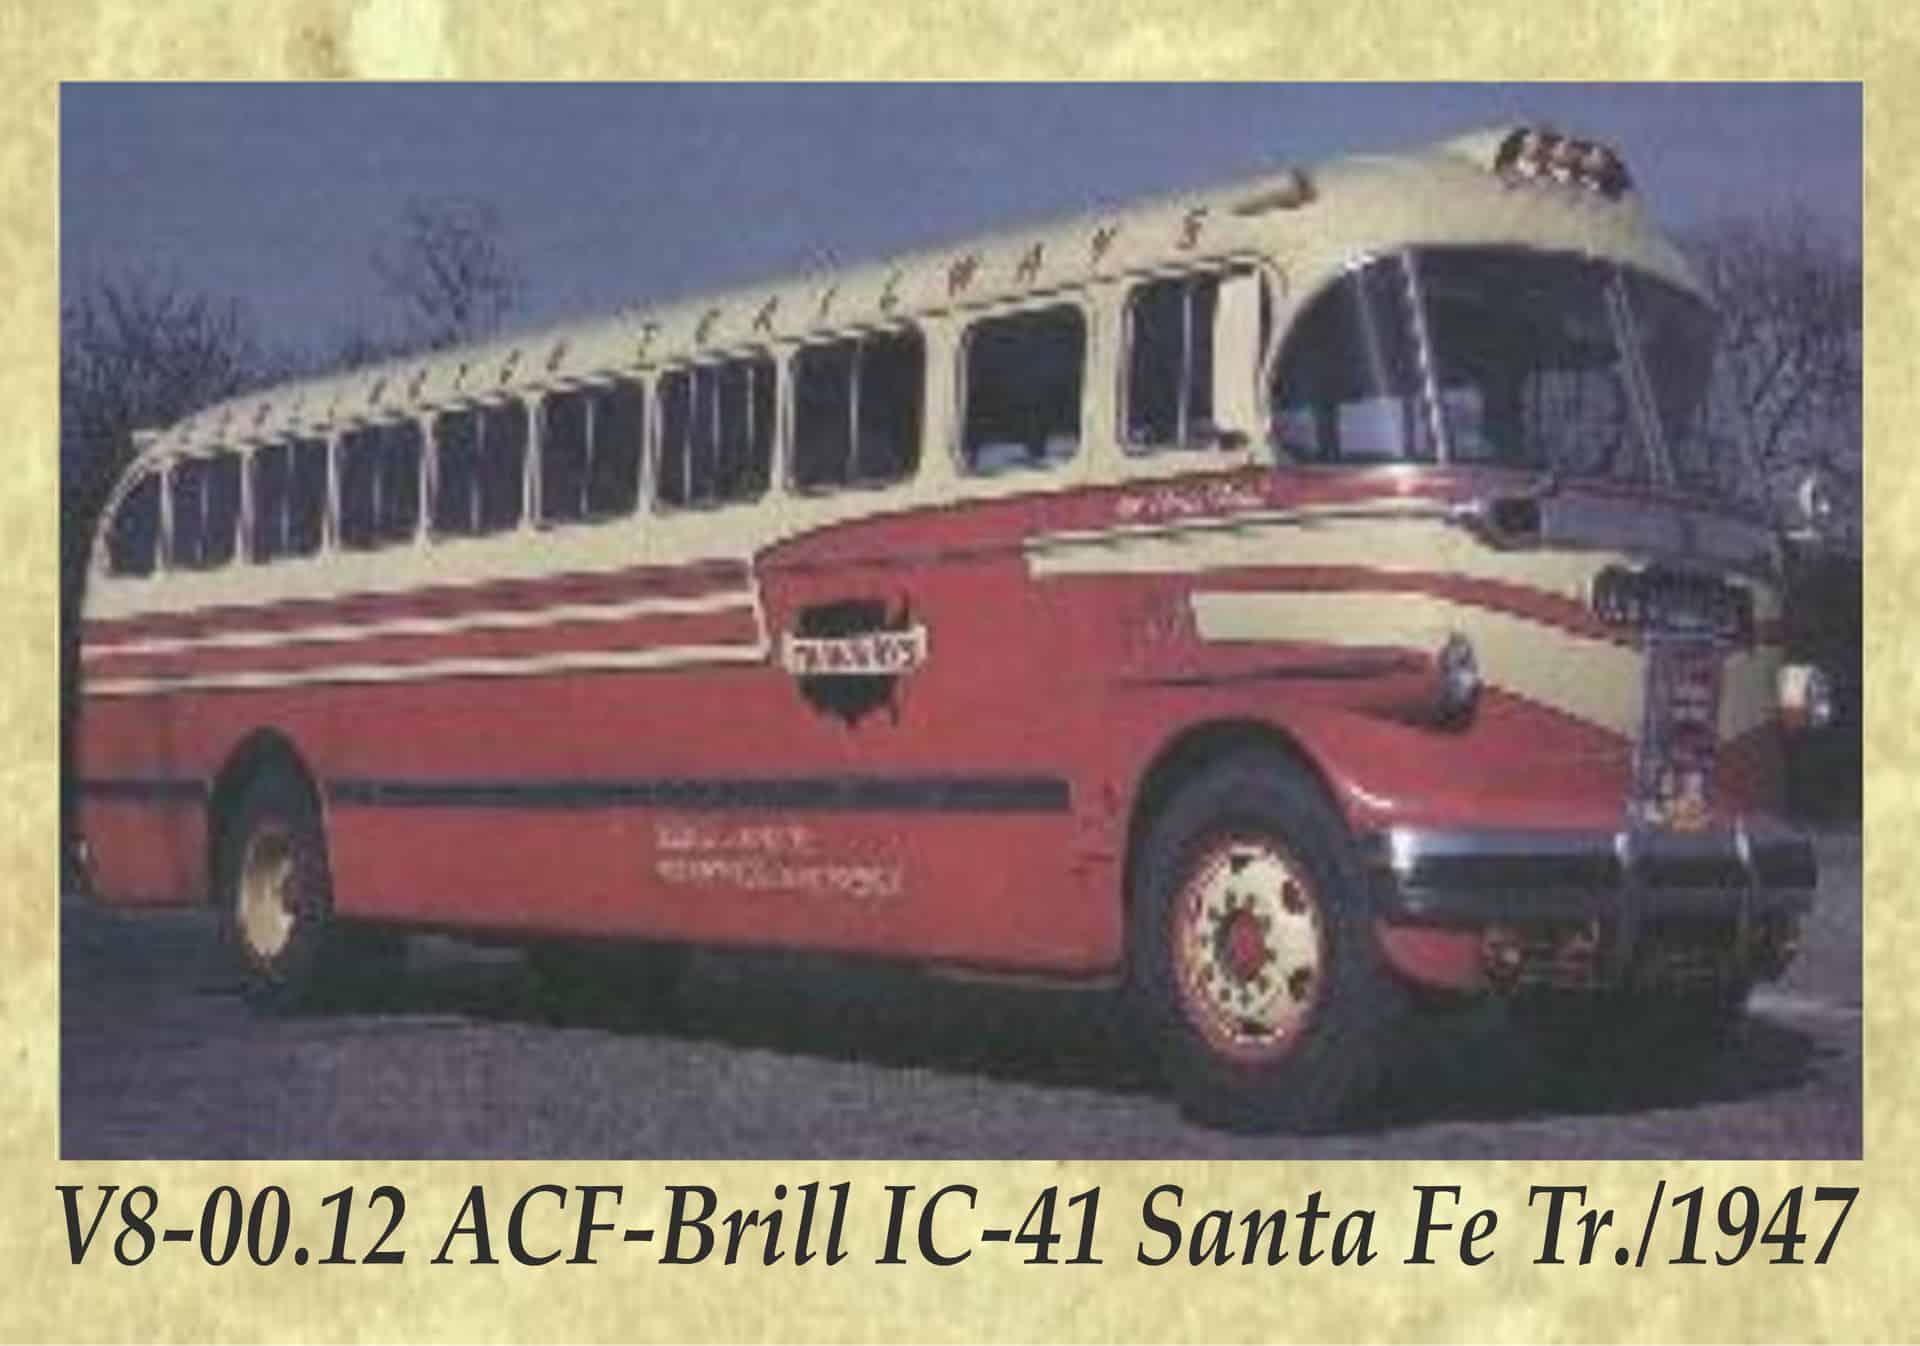 V8-00.12 ACF-Brill IC-41 Santa Fe Tr._1947